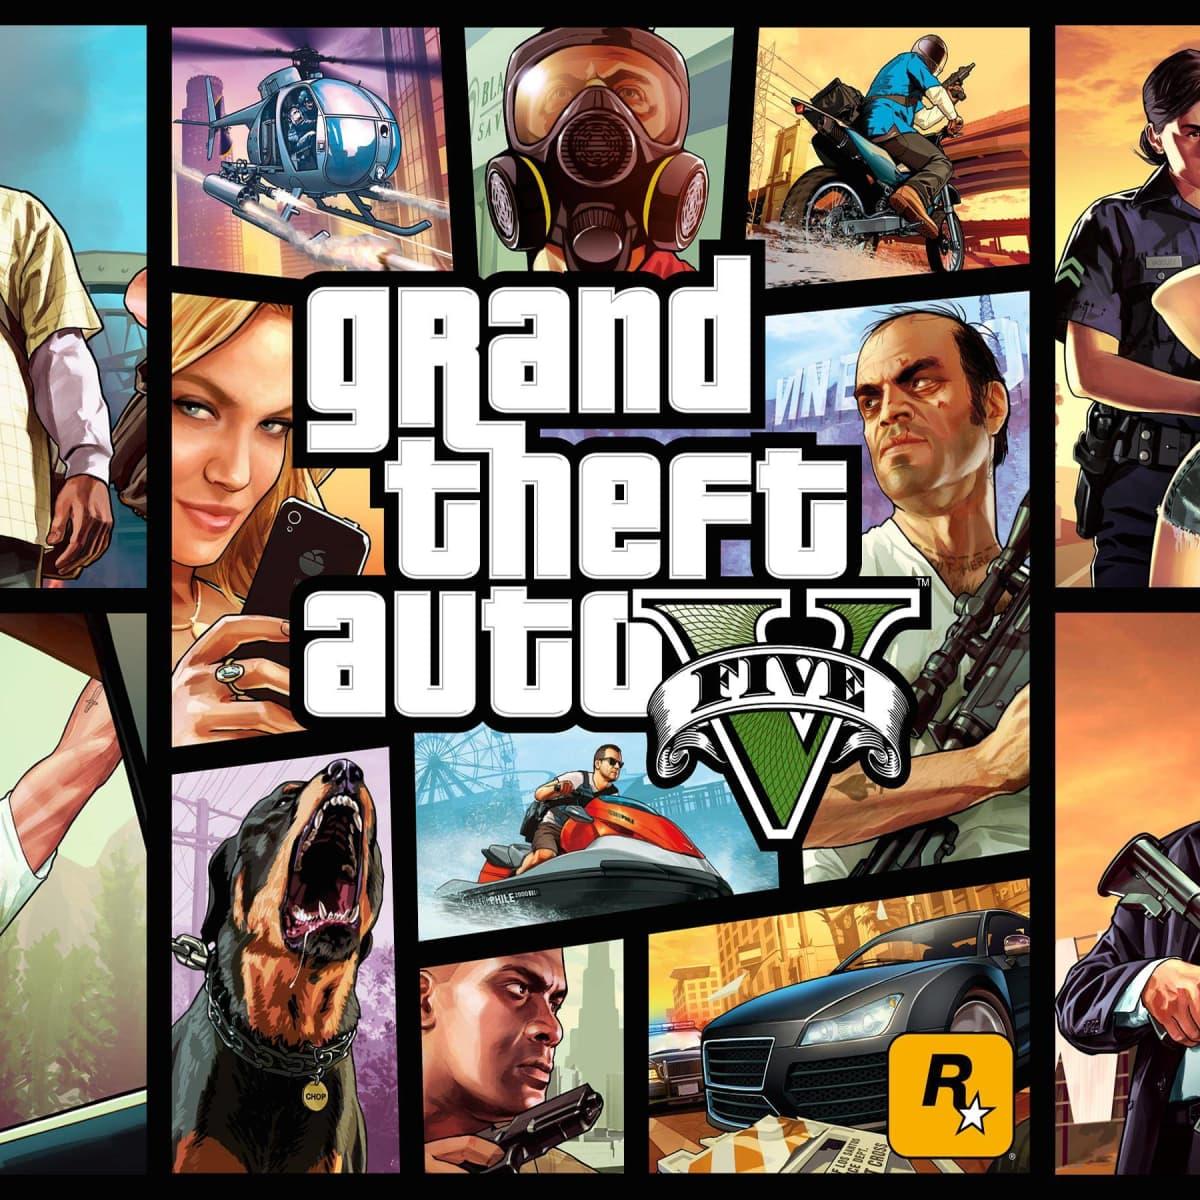 Grand Theft Auto 5 Gta V